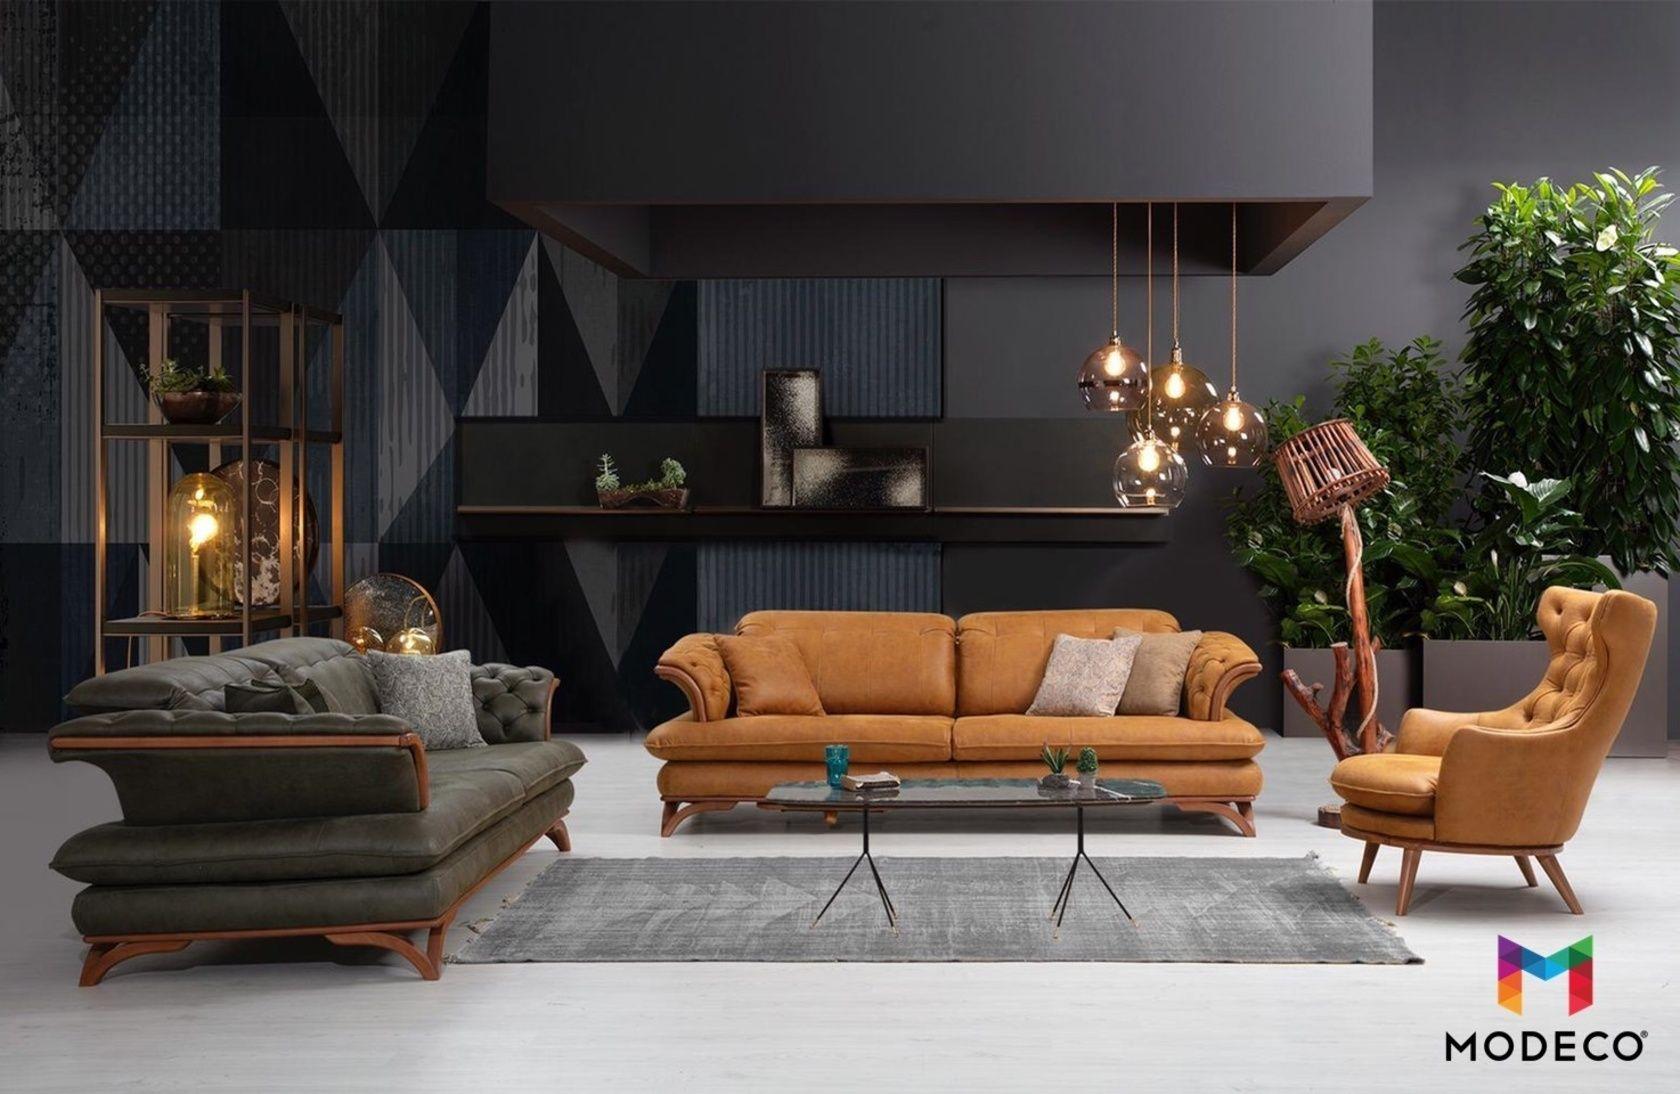 Napoli Mekanizmali Koltuk Takimi Urun Detaylari Ve Diger Urunlerimiz Icin Www Modeco Com Tr Whatsapp Iletisim Hatti 0362 833 81 In 2020 Home Decor Home Furniture